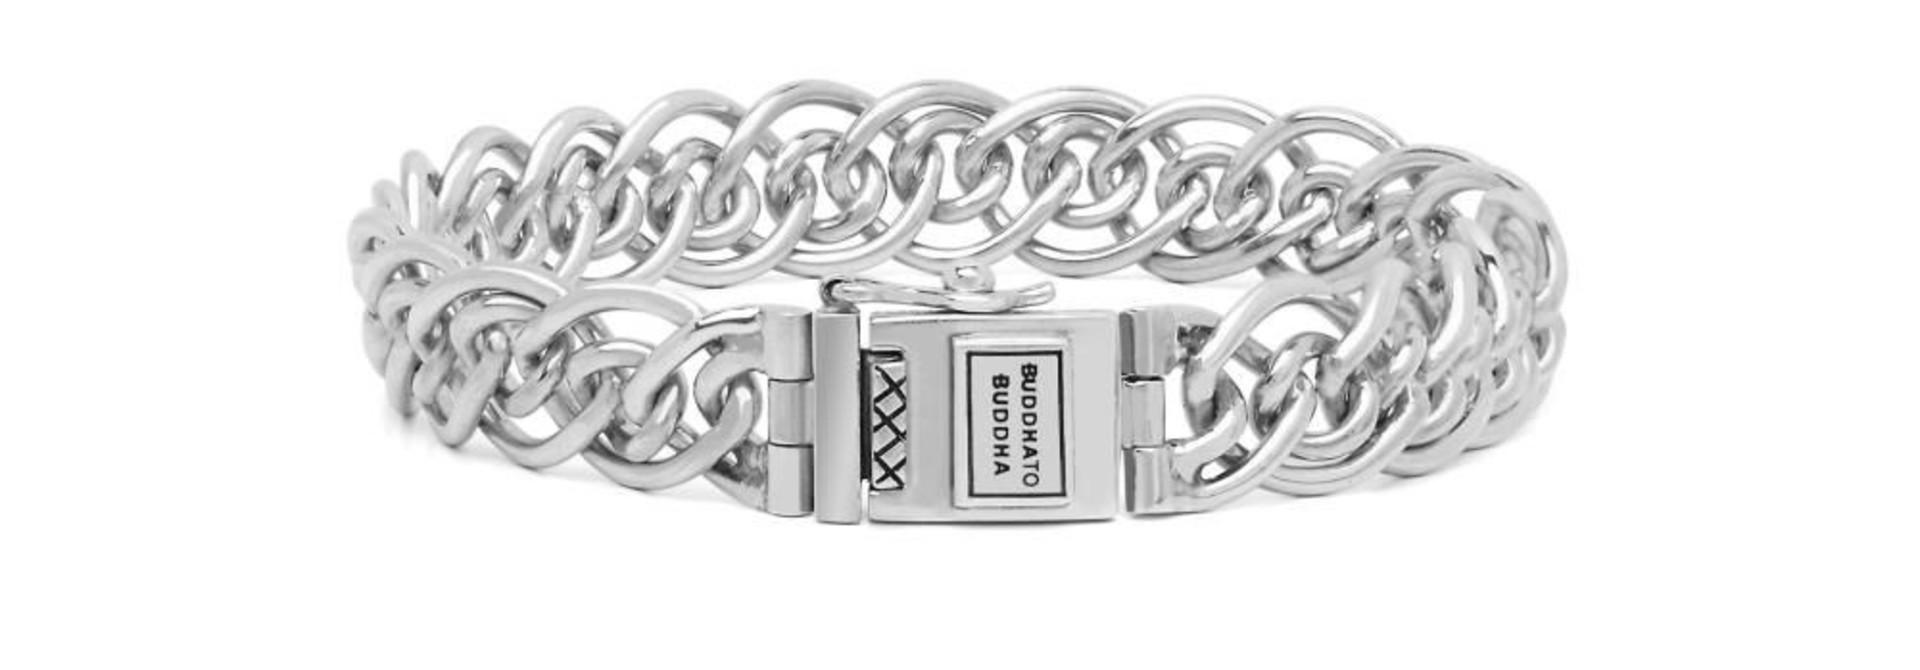 Nathalie Mini Bracelet